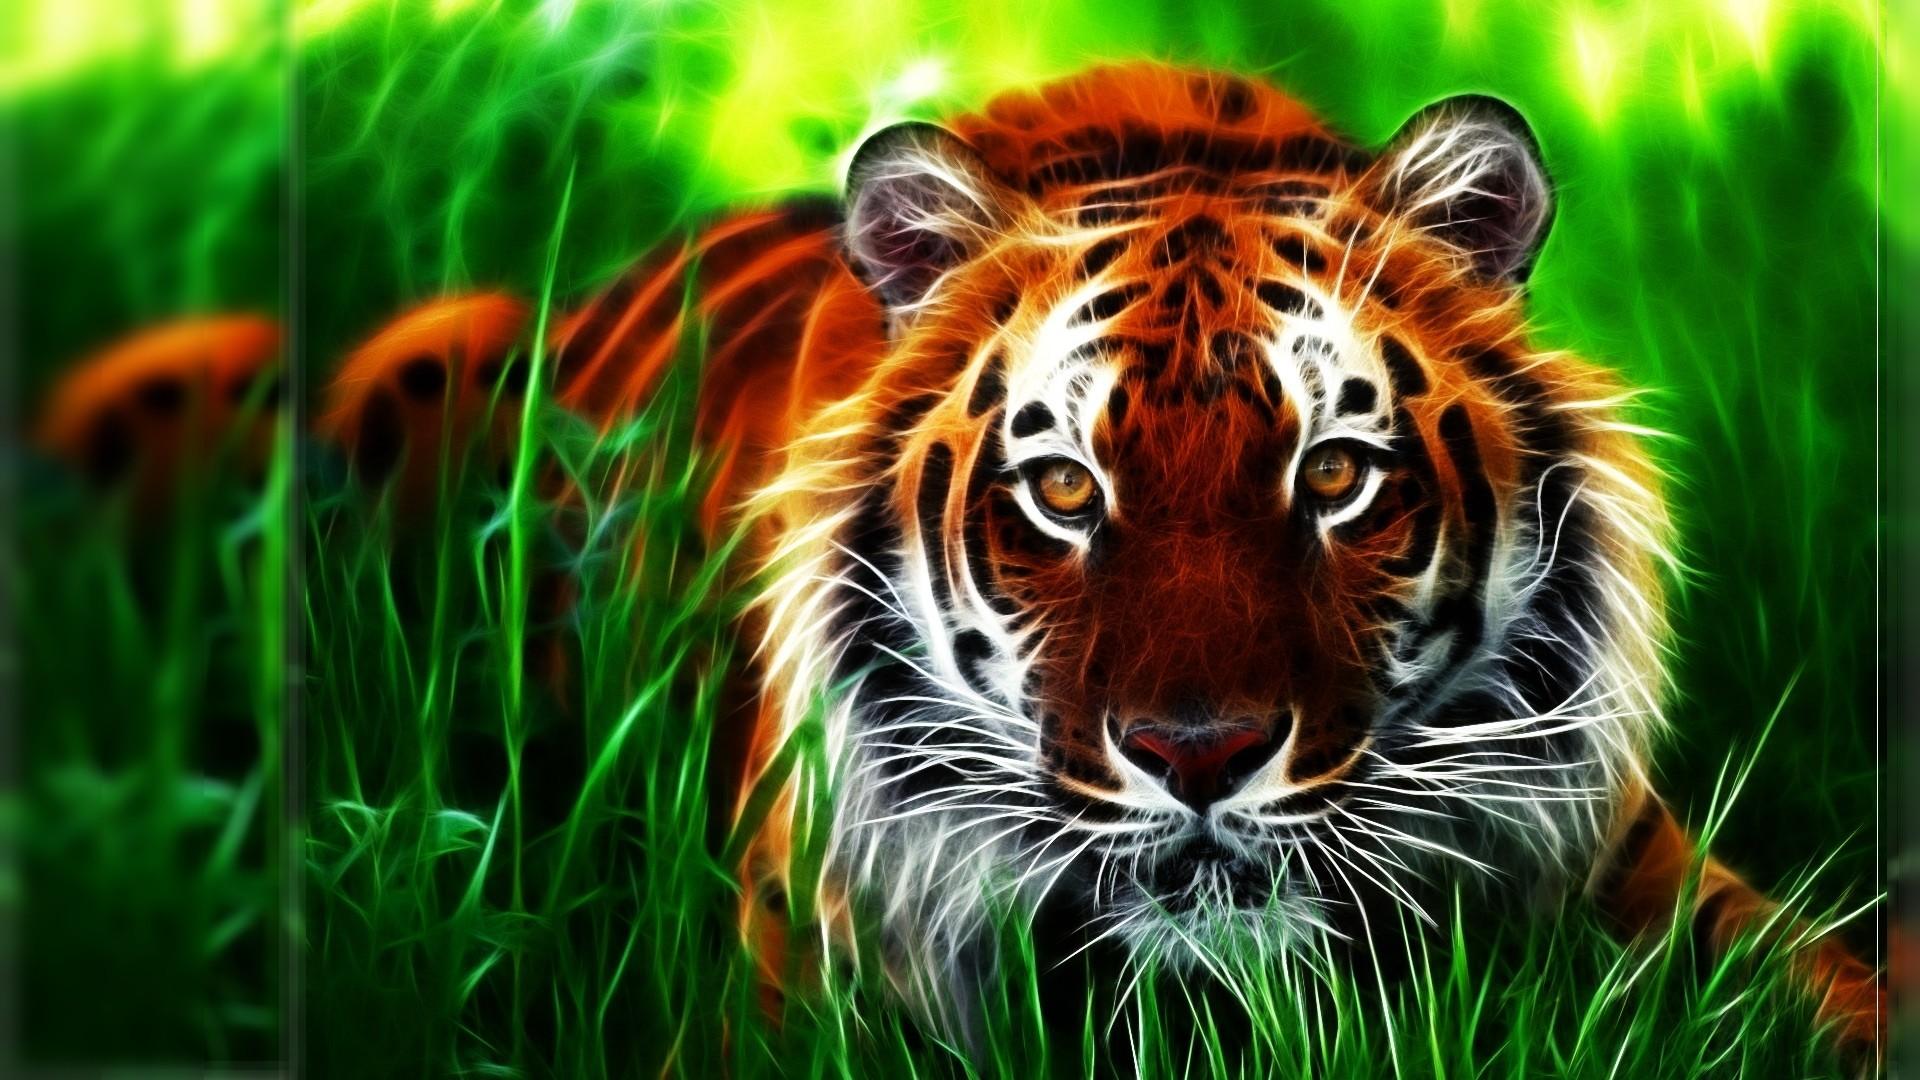 Free Clemson Tigers Wallpaper, 43 HD Clemson Tigers Wallpapers .